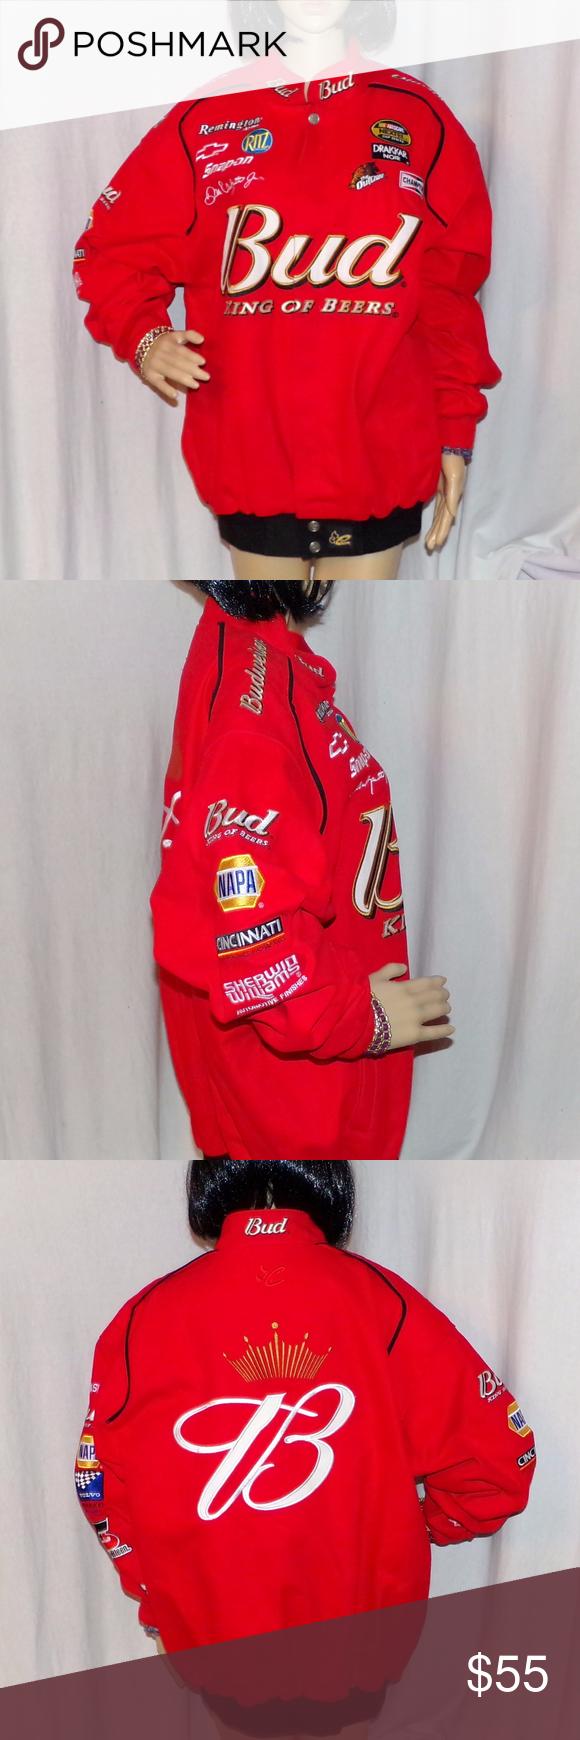 Dale Earnhardt Jr 8 Drivers Jacket NASCAR Bud Clothes